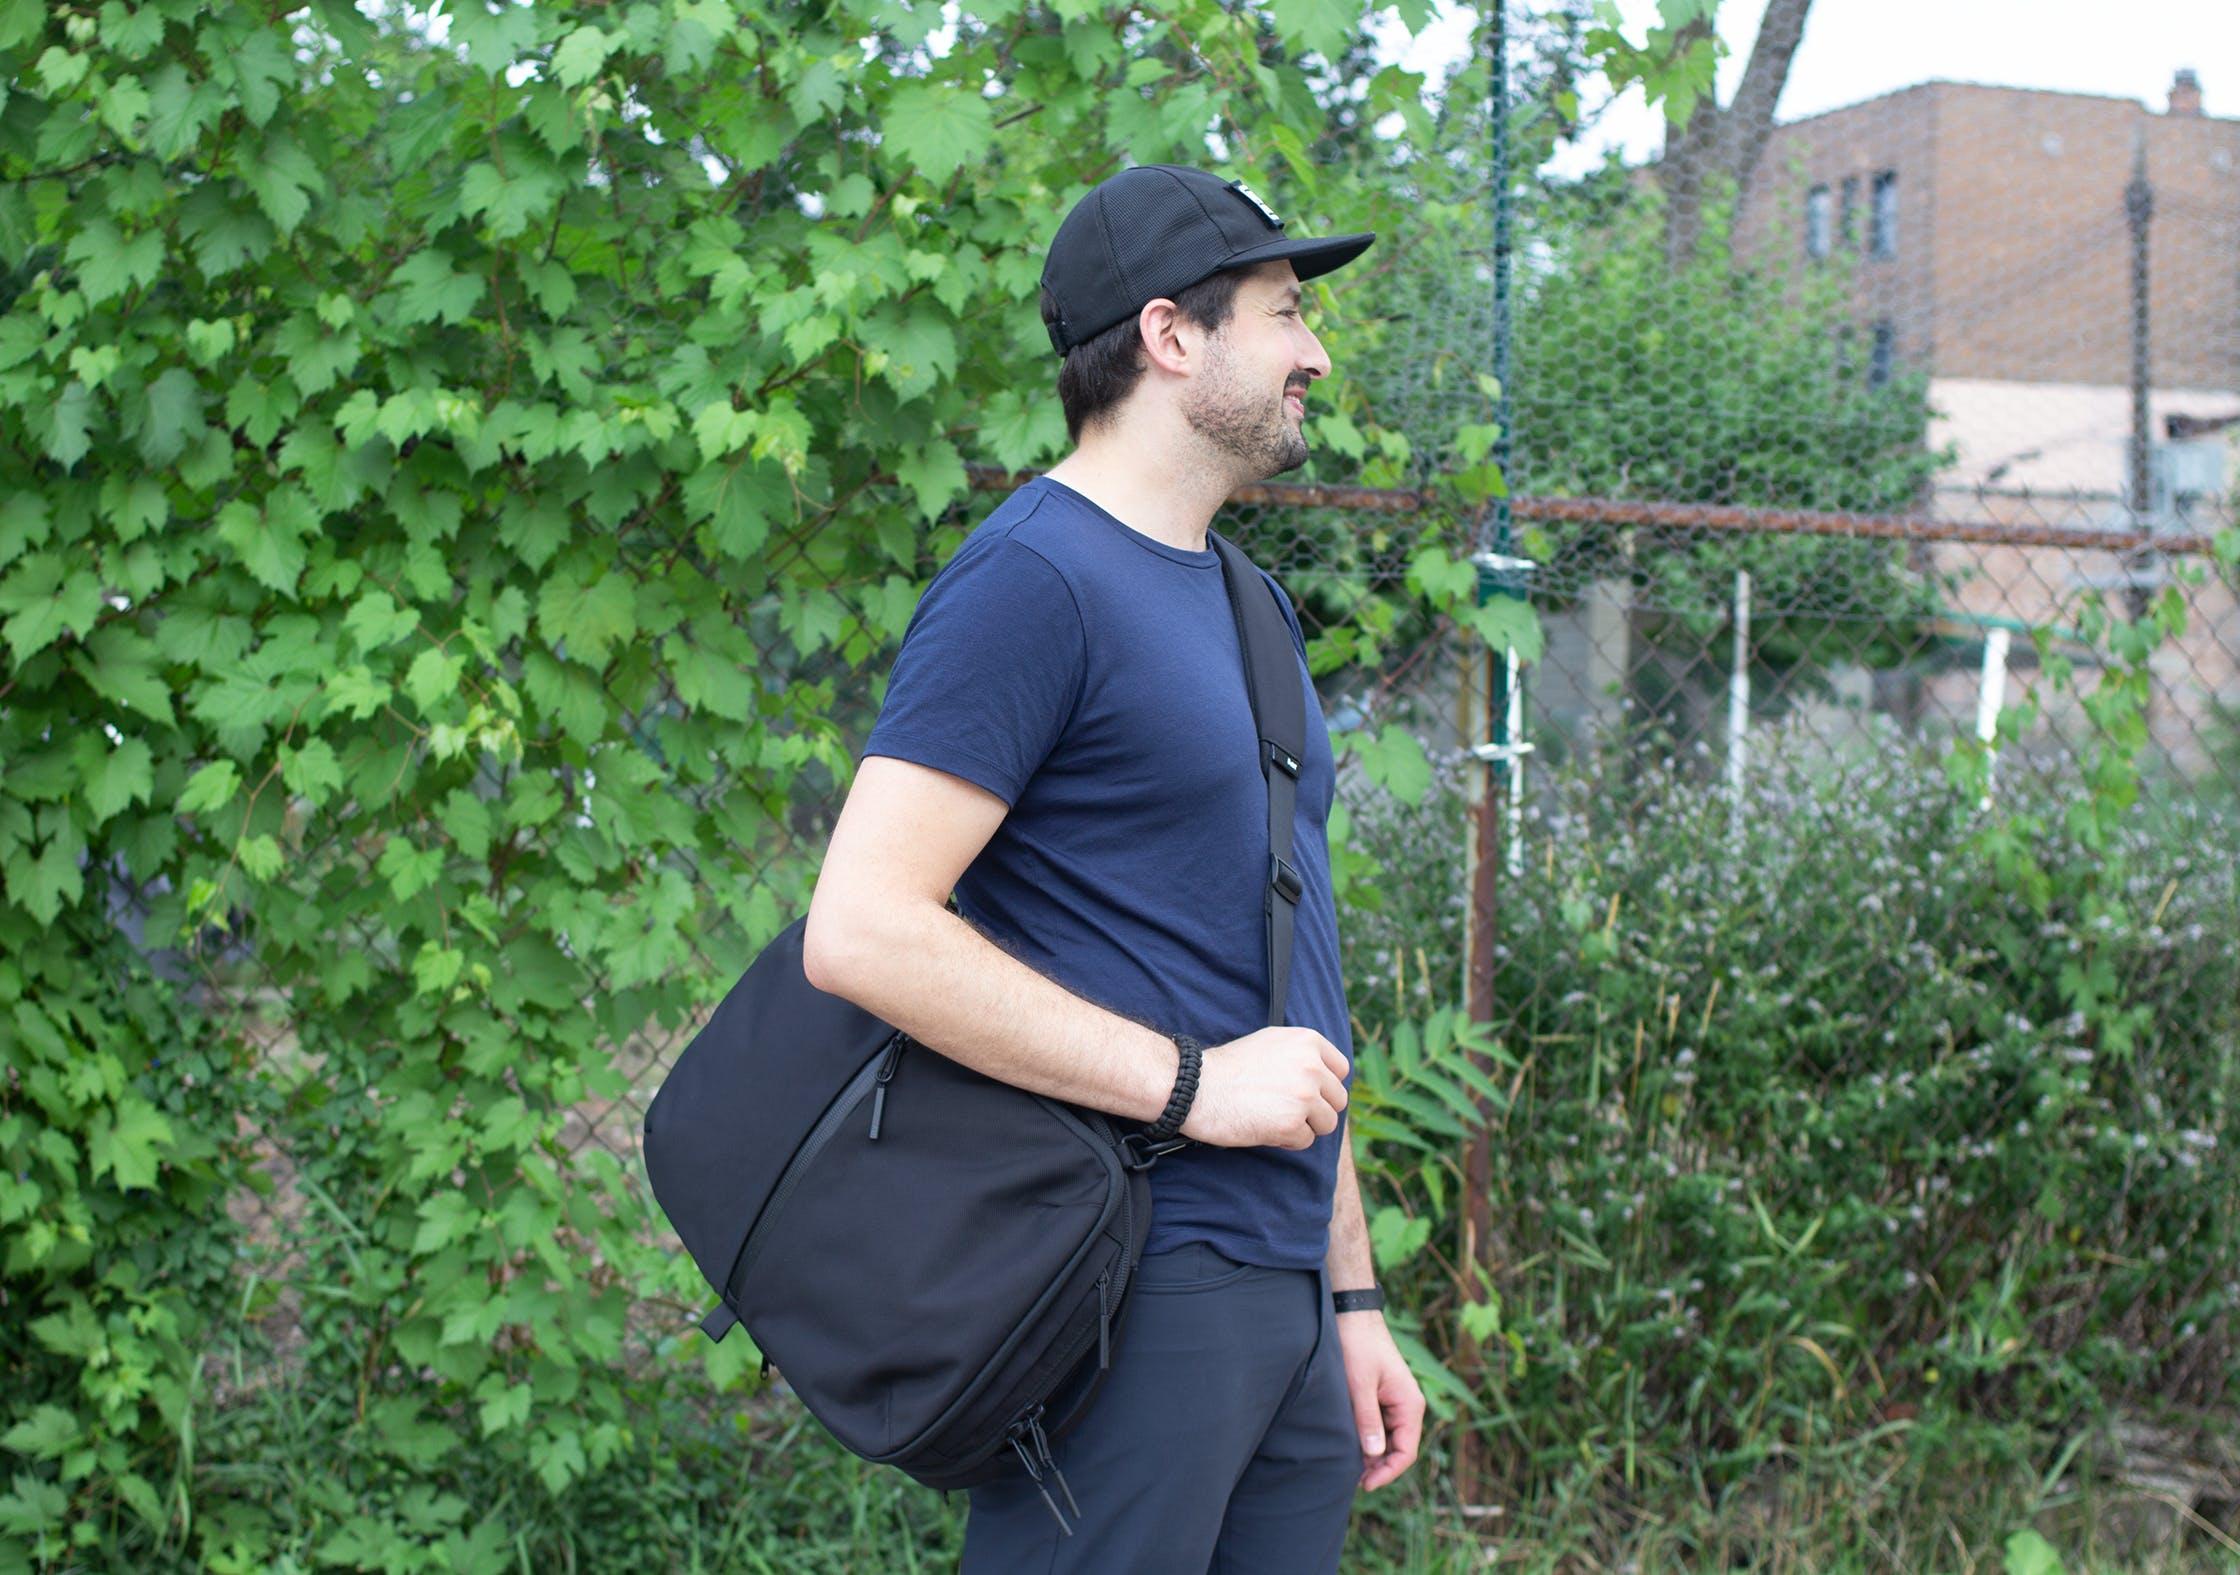 Aer Flight Pack 2 As Messenger Bag